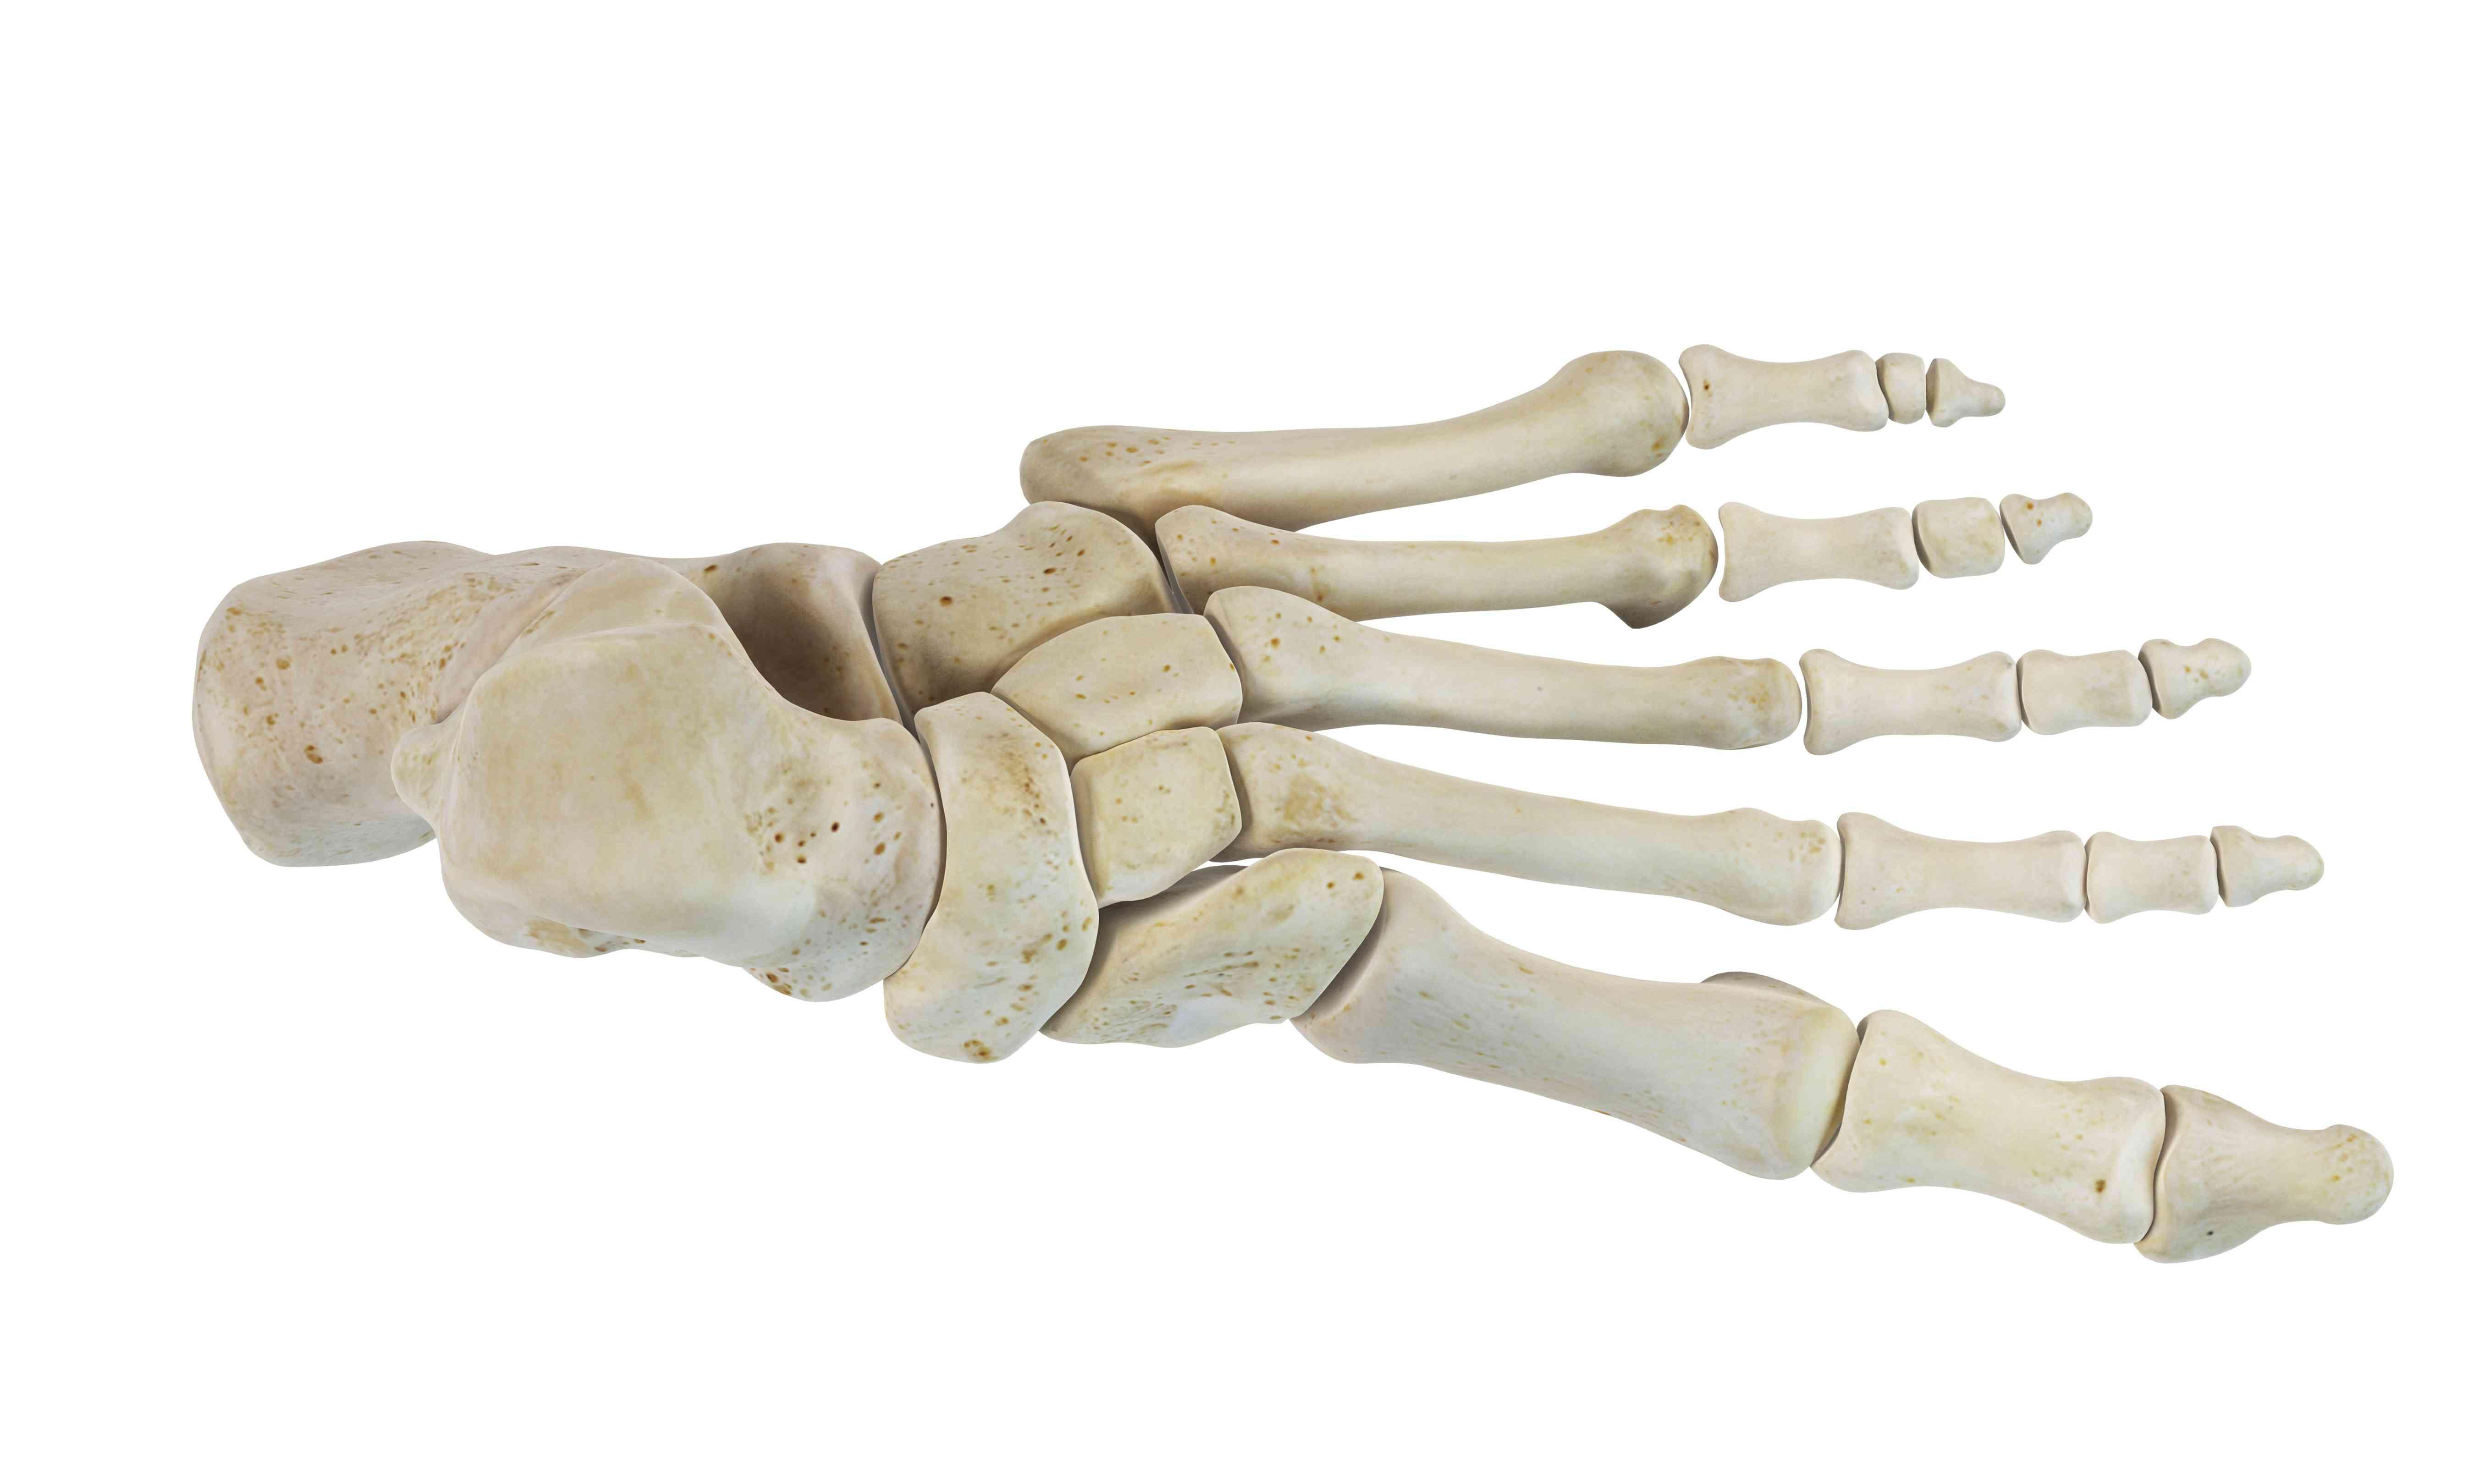 Human foot bones on white surface